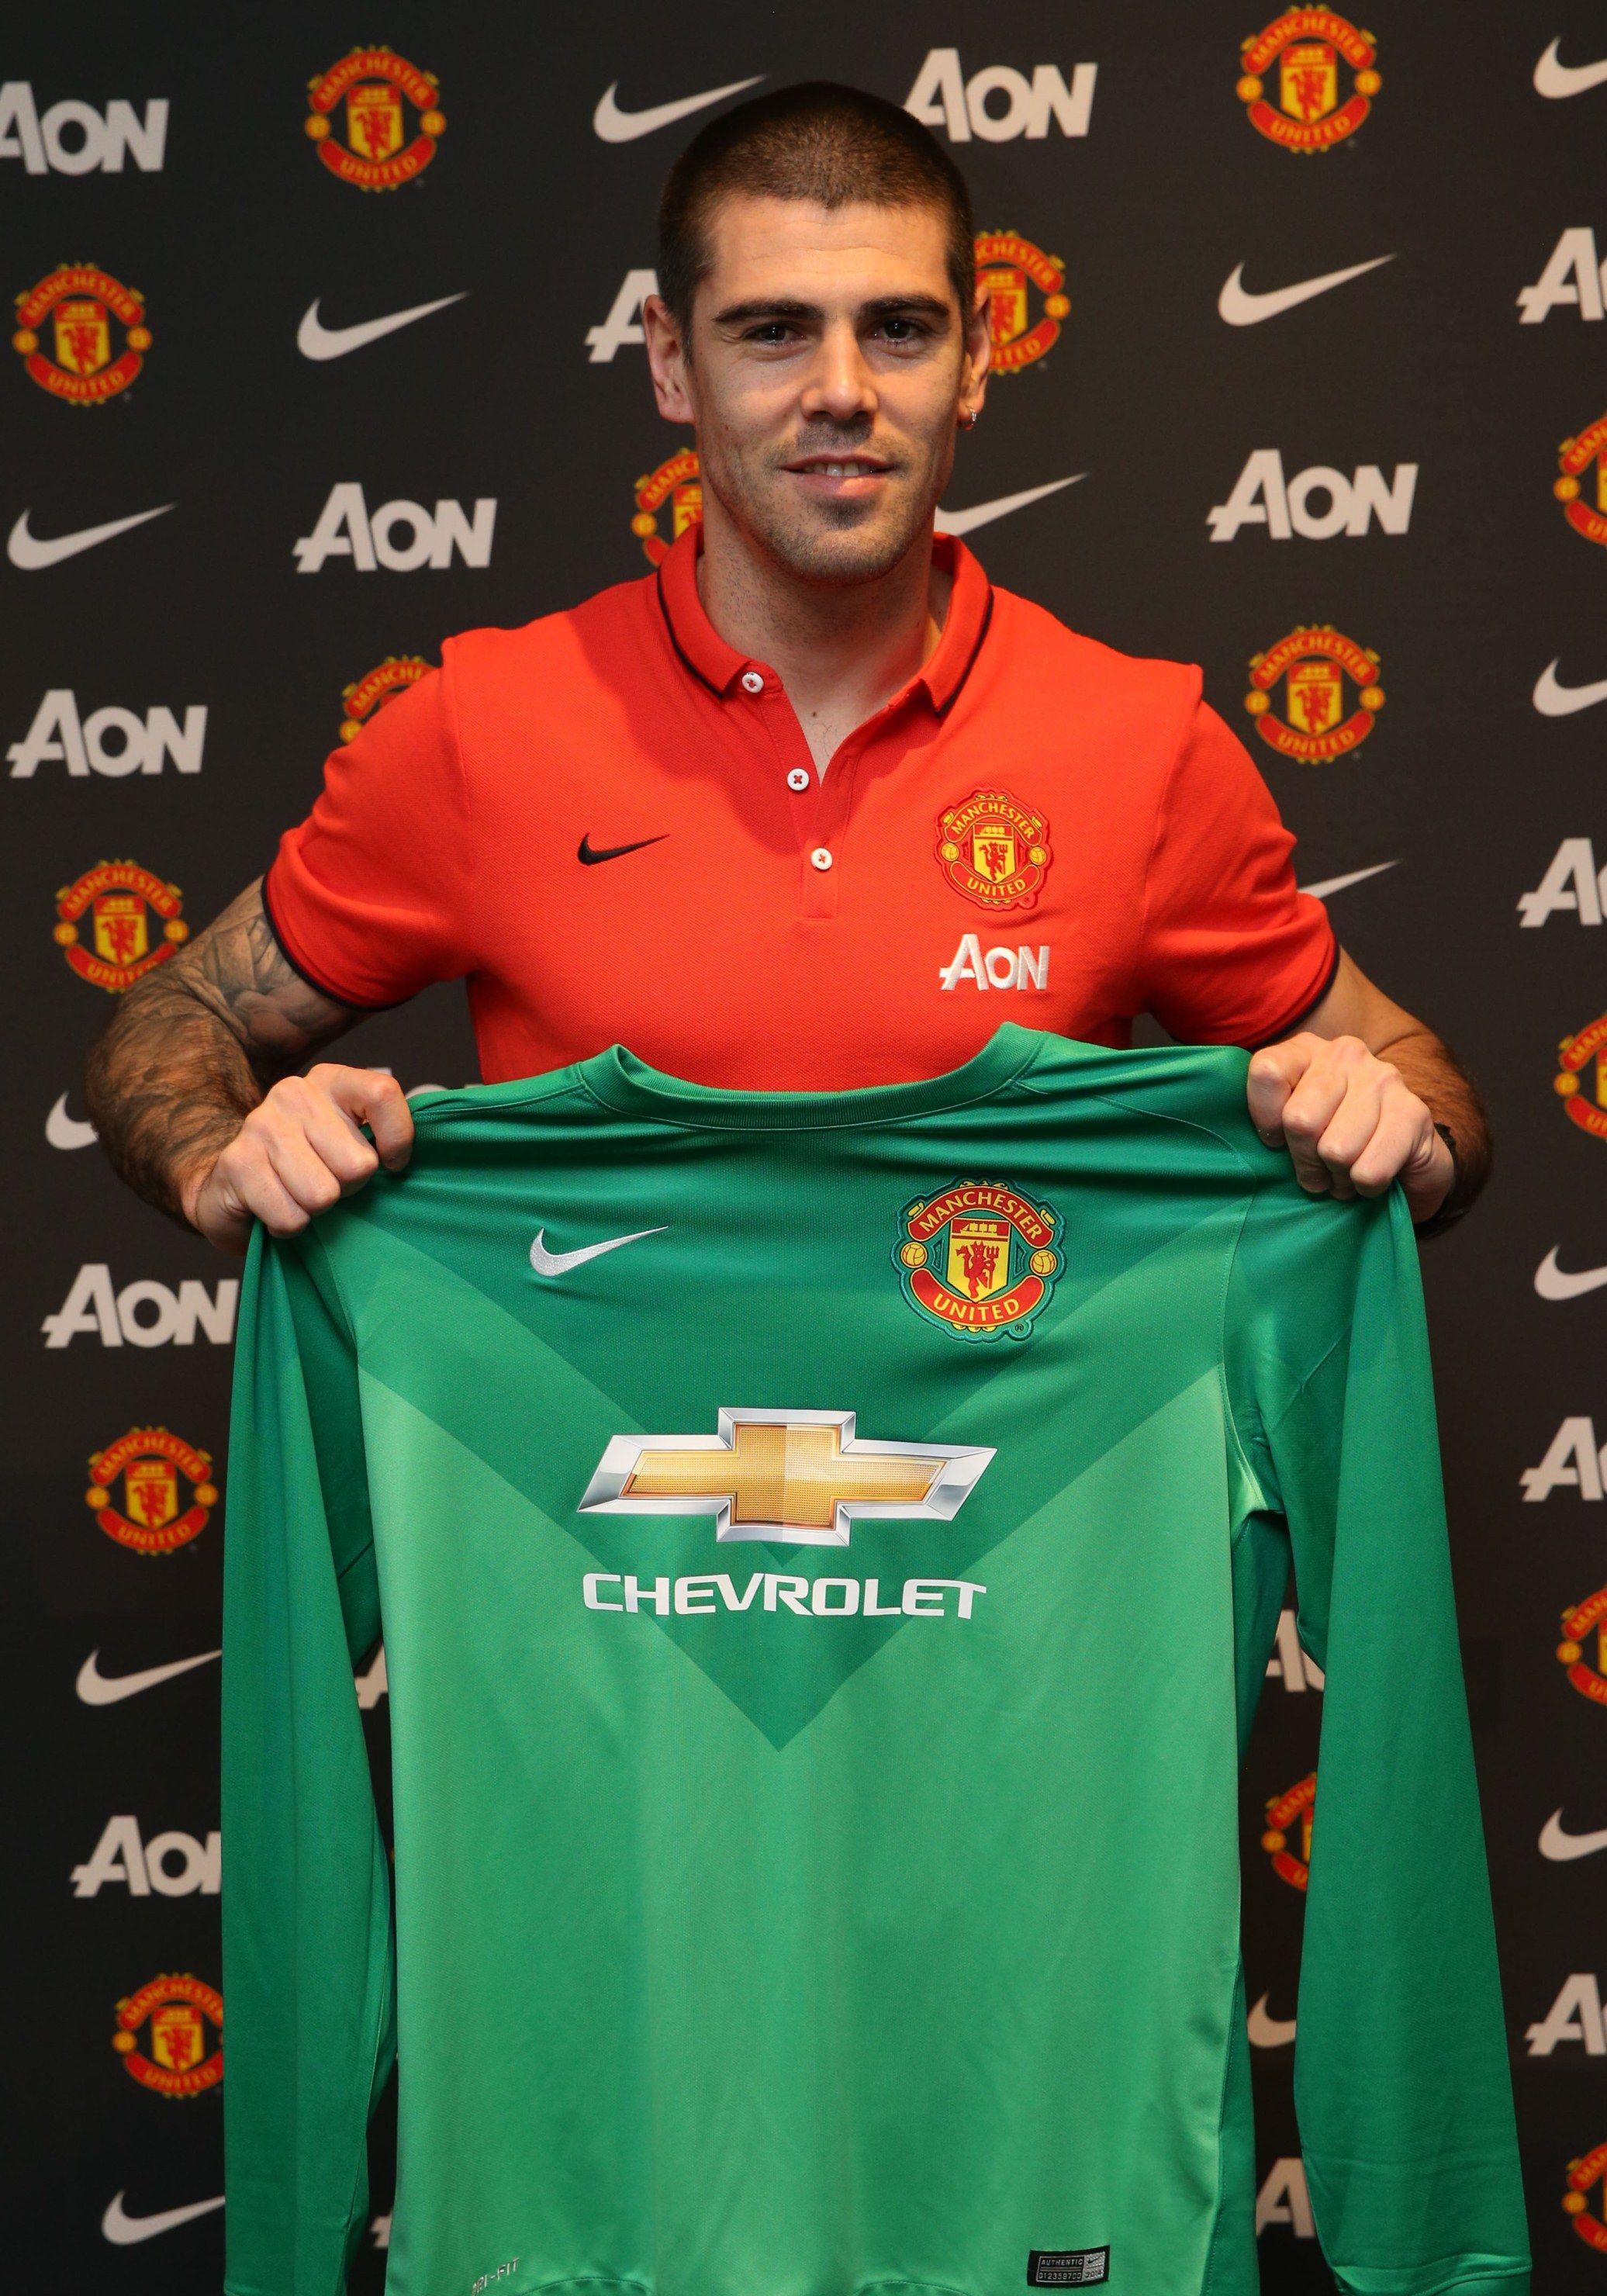 Manchester United Sign Victor Valdes Official Manutd Website Manchester United Players Manchester United Shirt Manchester United